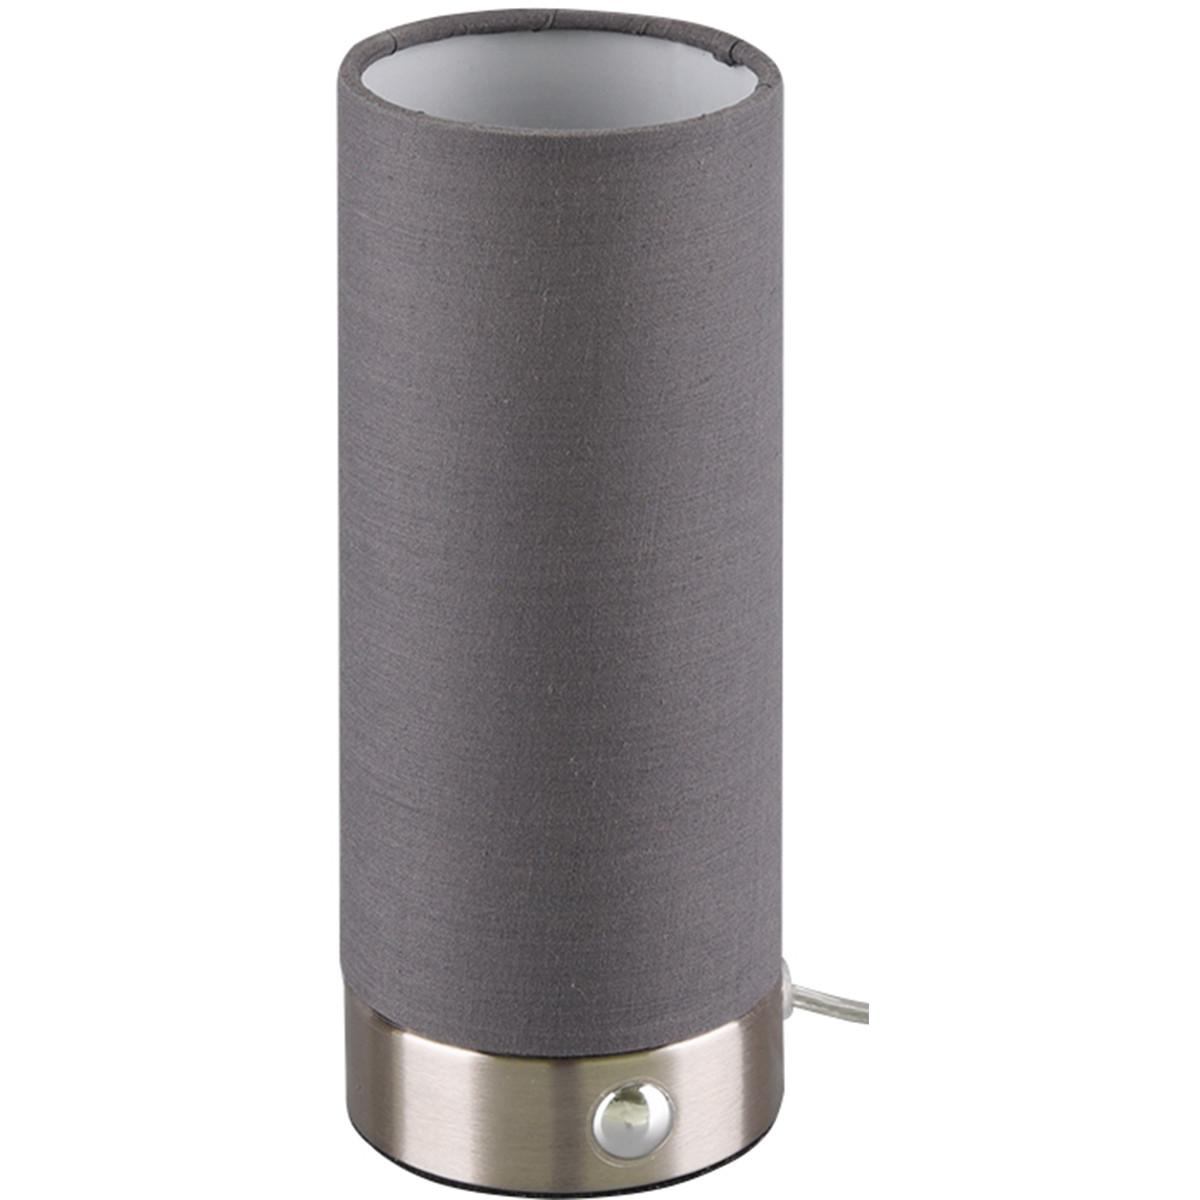 LED Tafellamp - Trion Emiron - 5W - Warm Wit 3000K - Dimbaar - Rond - Mat Nikkel/Grijs - Aluminium/T